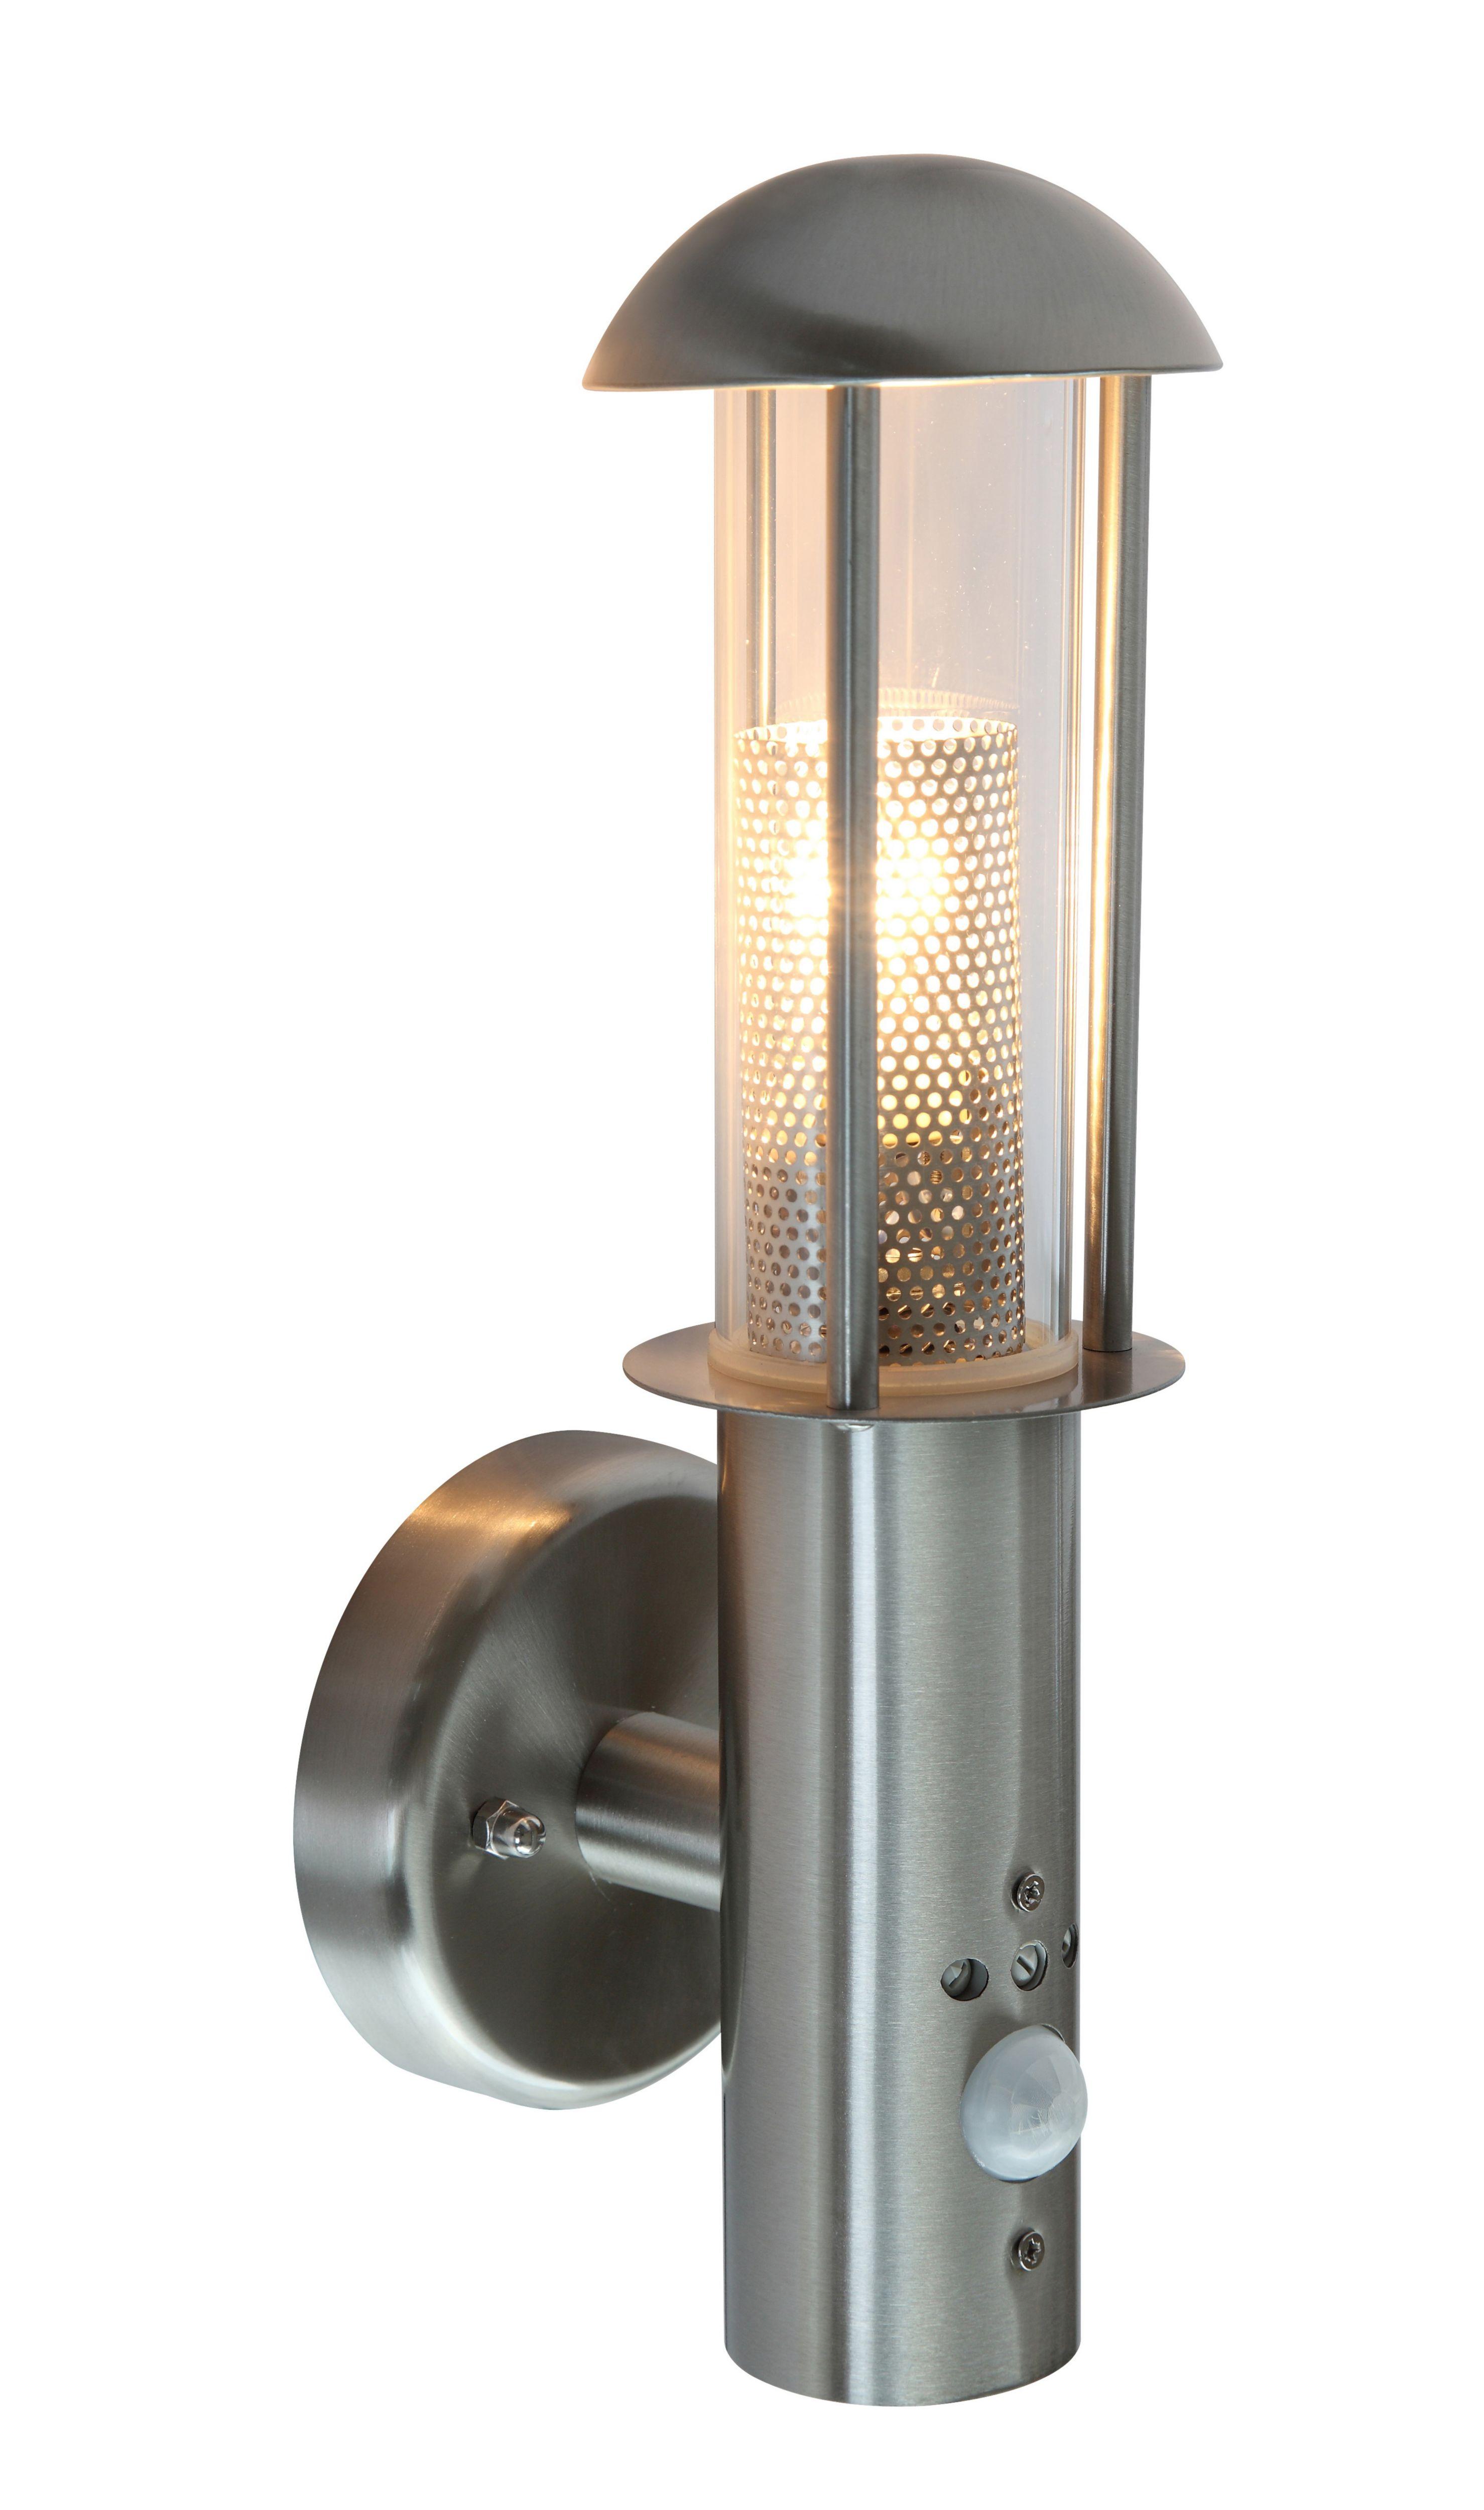 Blooma Tellumo Stainless Steel 28w Mains Powered External Pir Wall Light